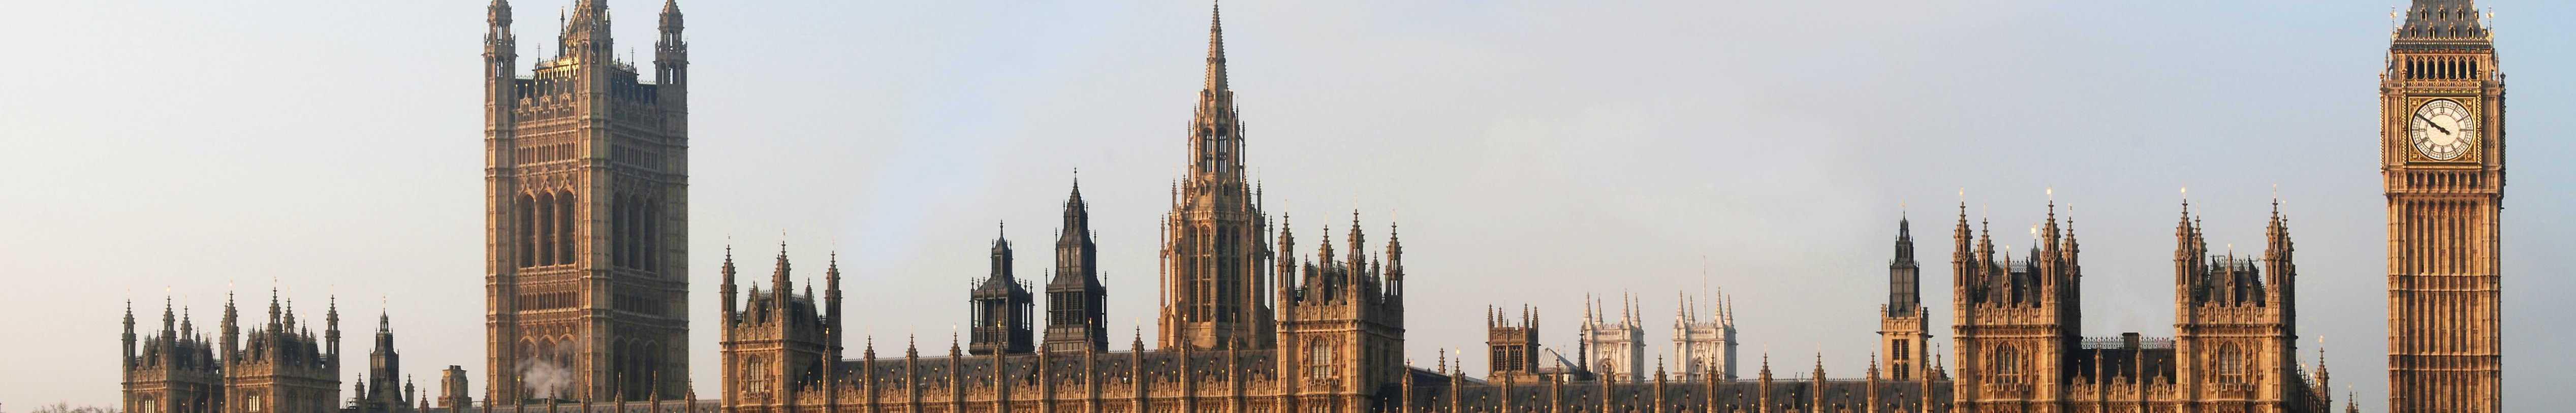 UK议会 banner